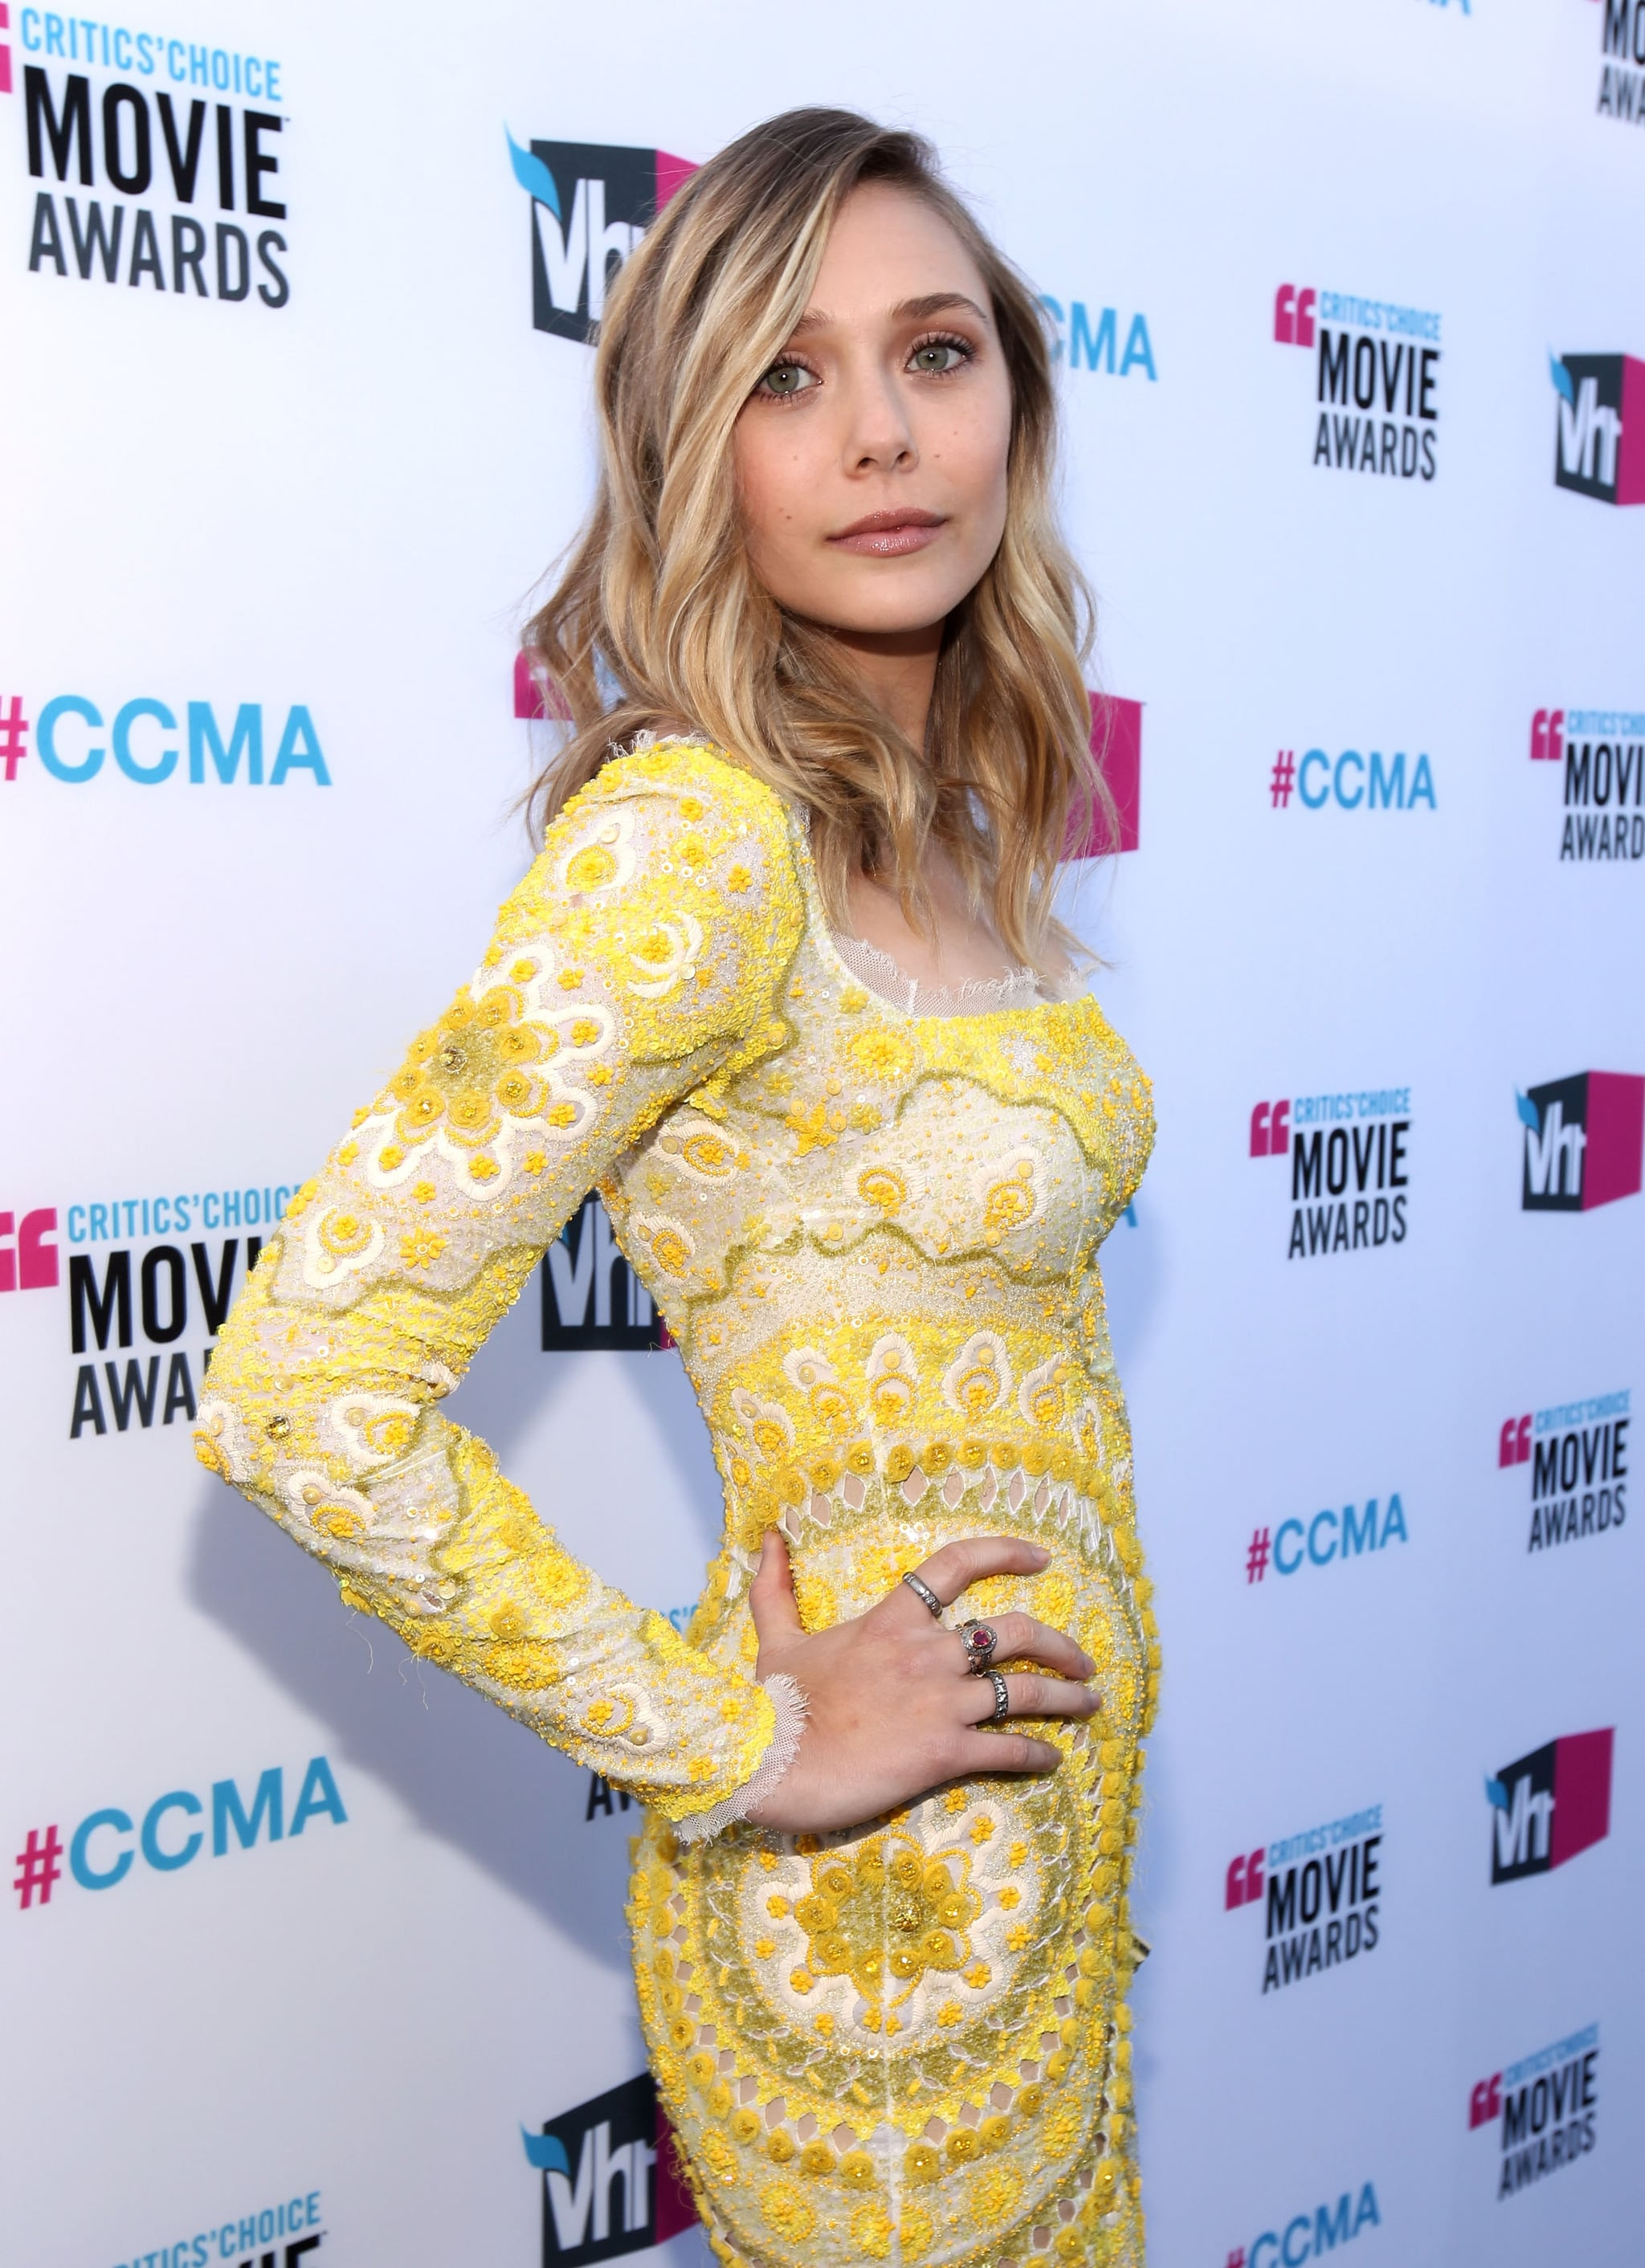 Elizabeth Olsen showed off her yellow Emilio Pucci dress.